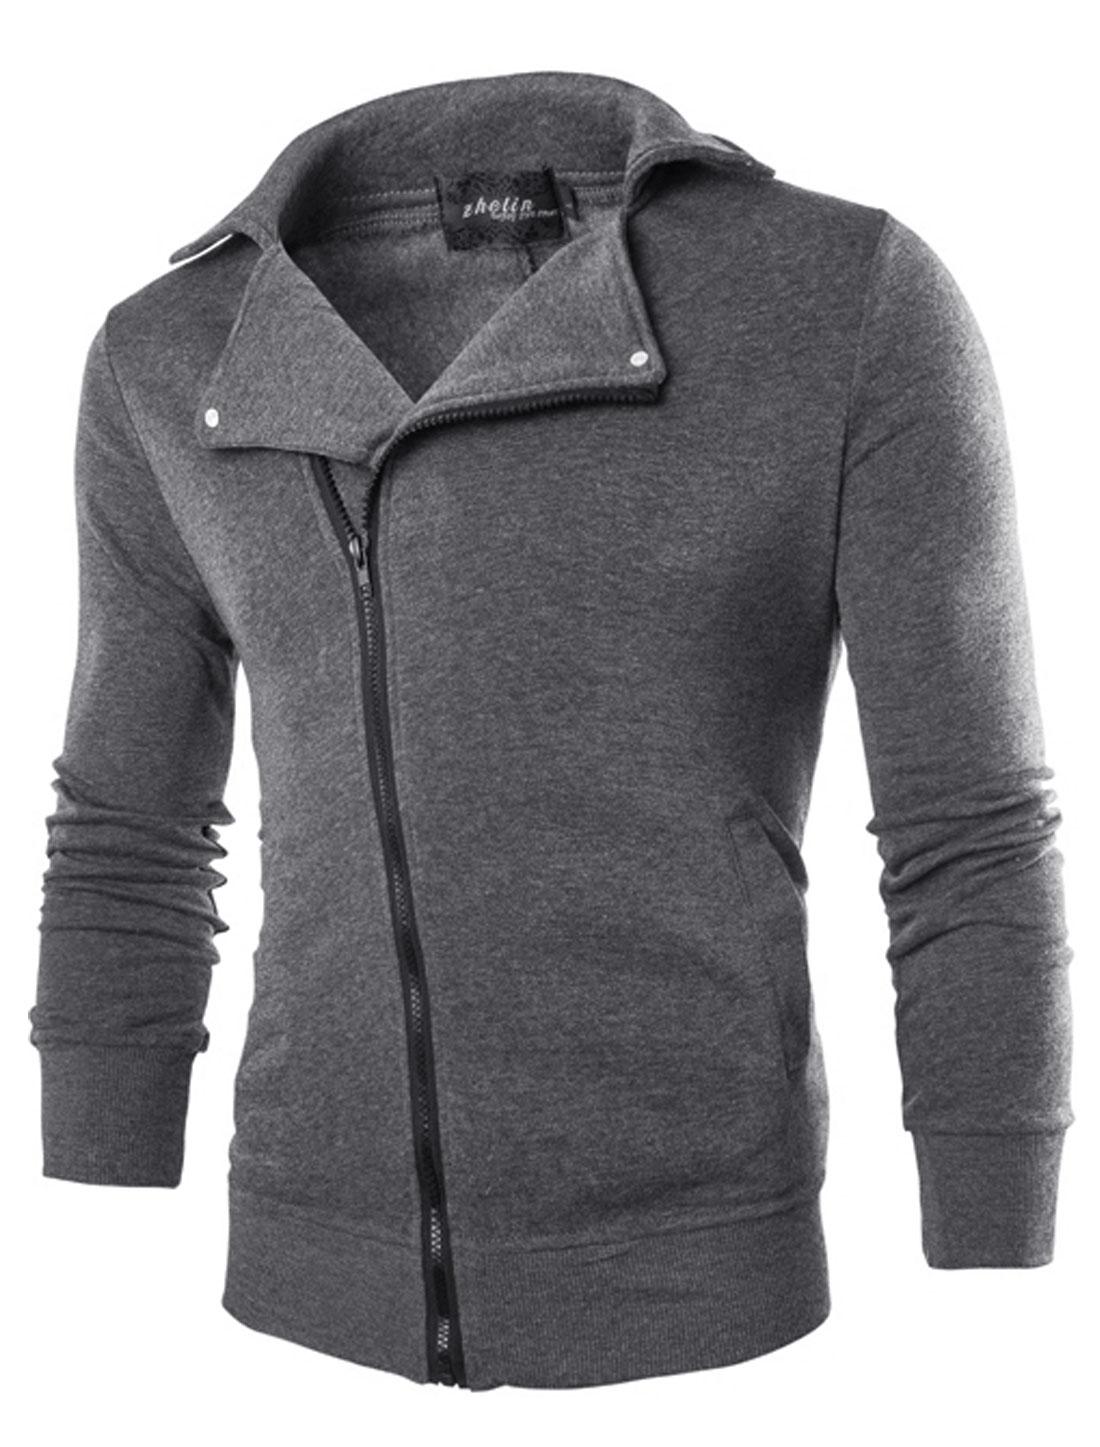 Men Inclined Zip Closure Turn Down Collar Casual Jacket Dark Gray M